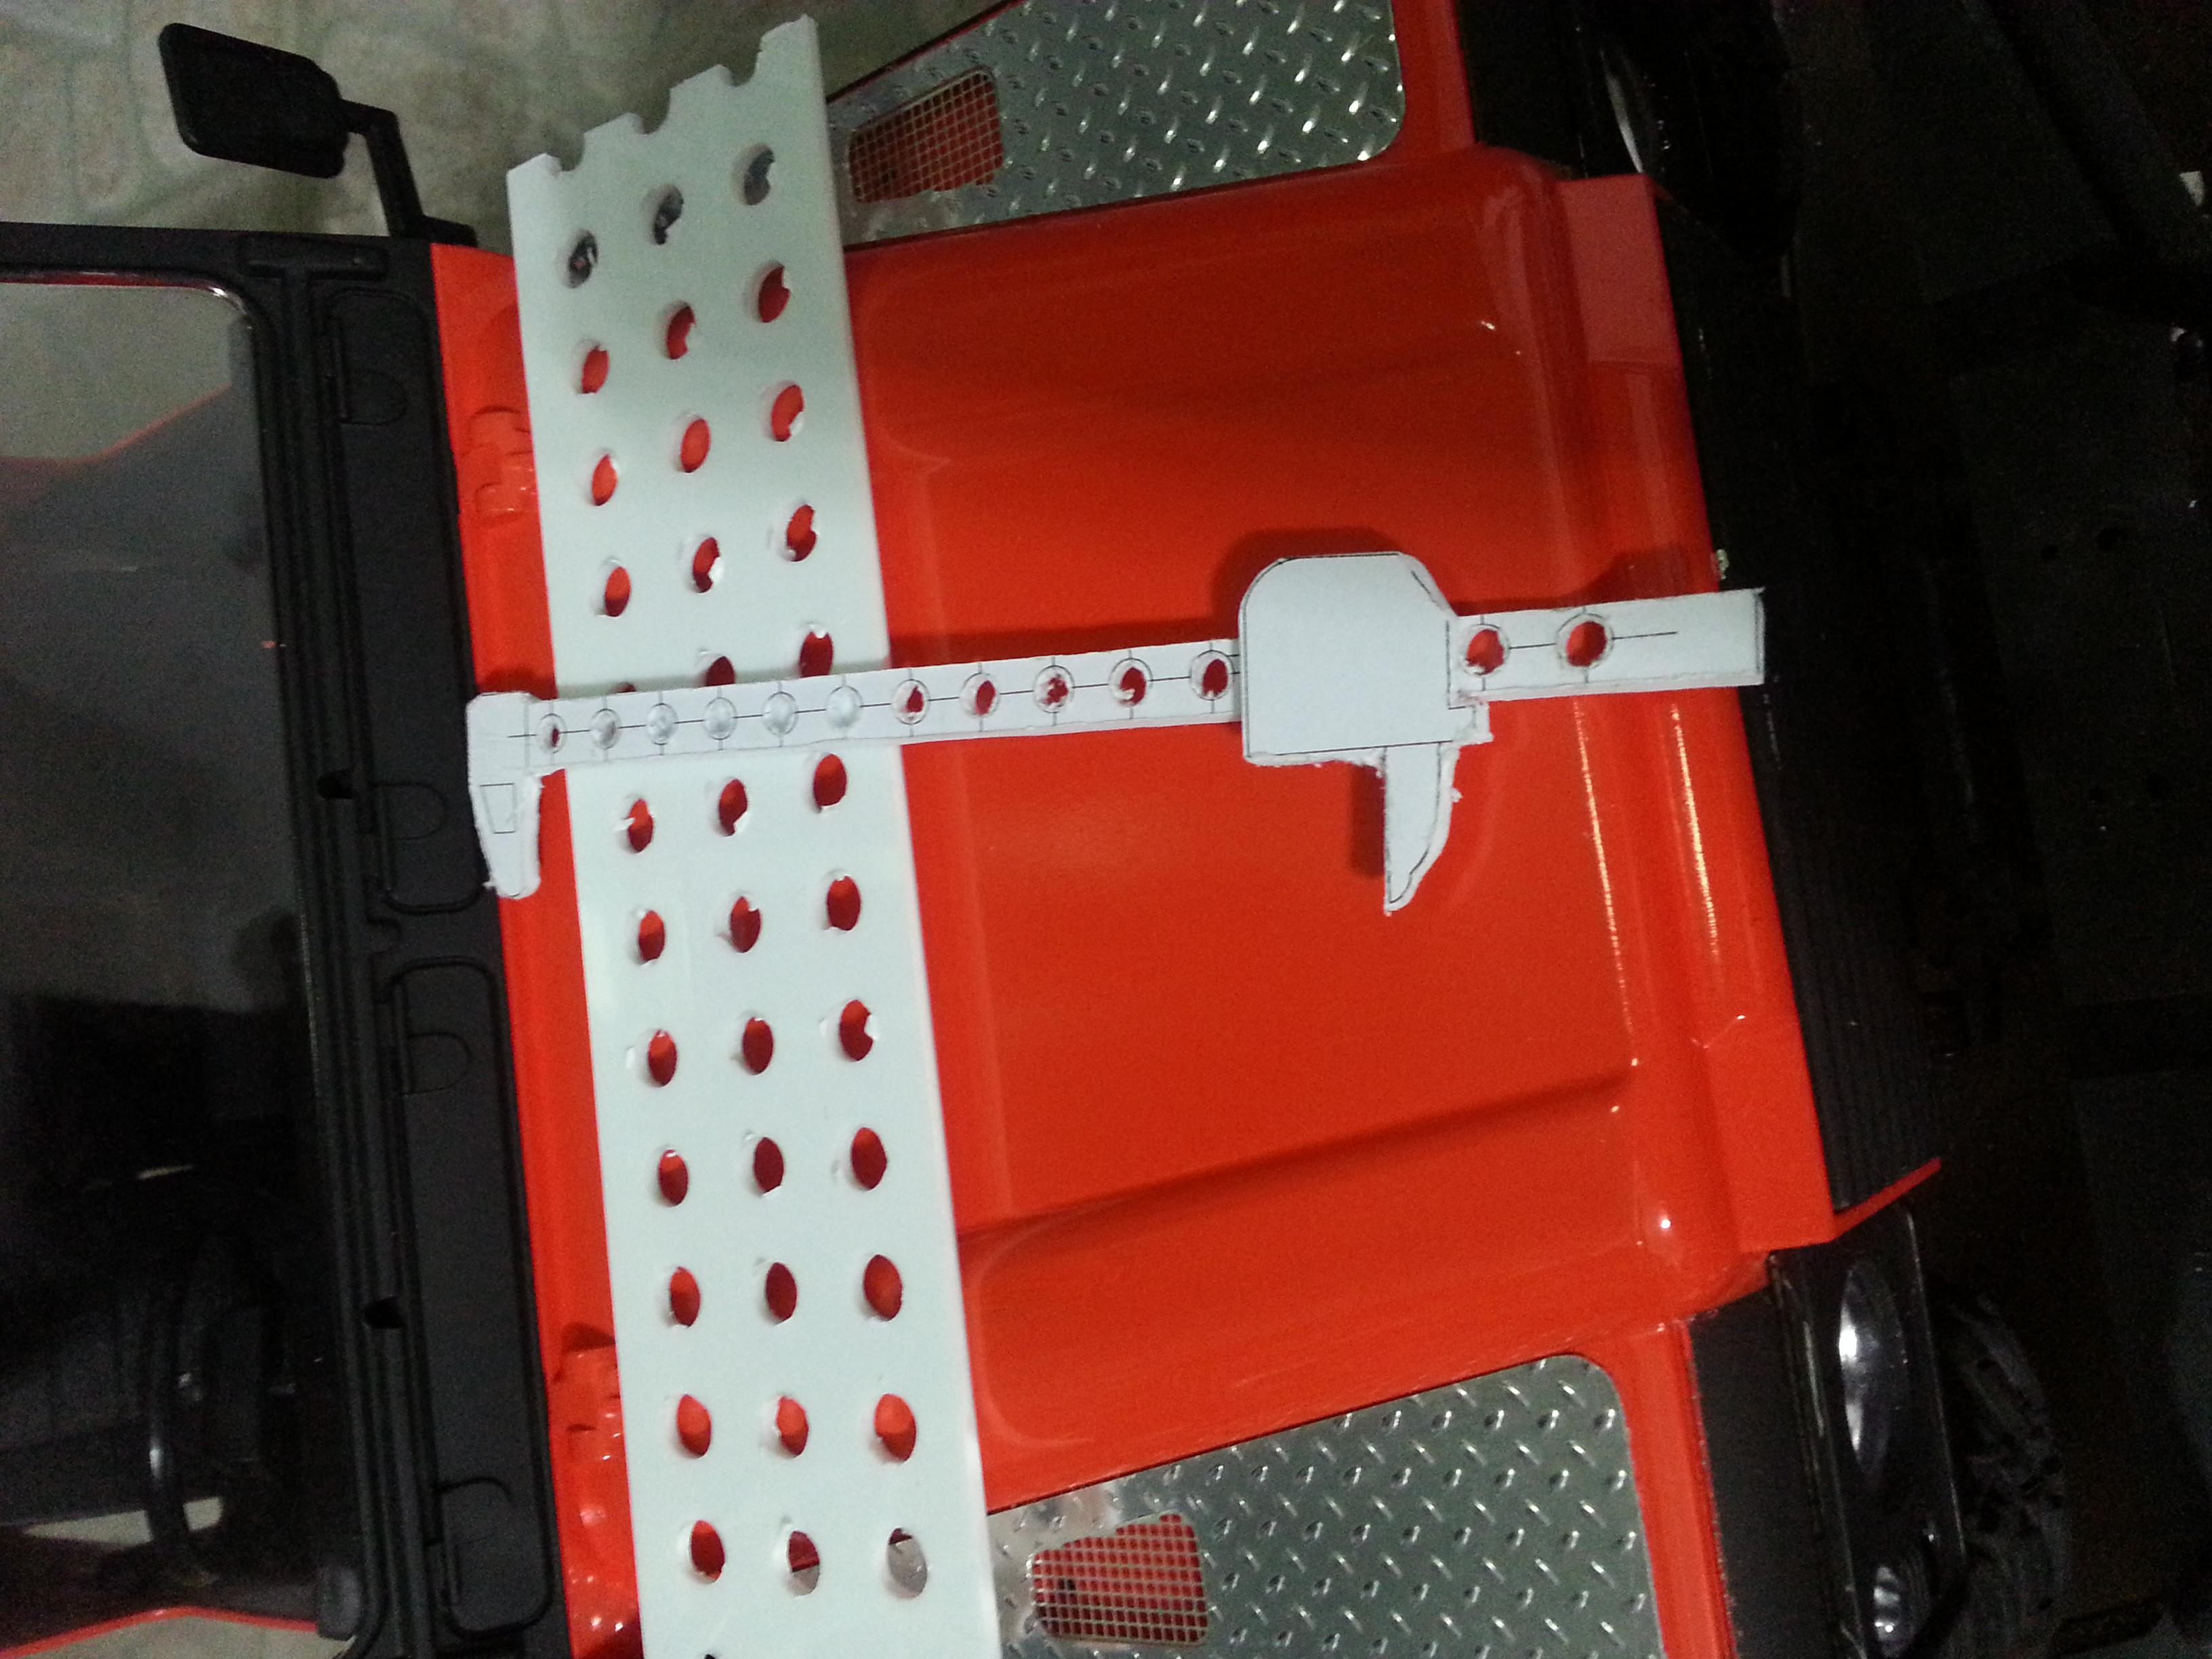 rover - Babyboy's 2nd Land Rover Defender D90 14981306332_585d94bc47_o